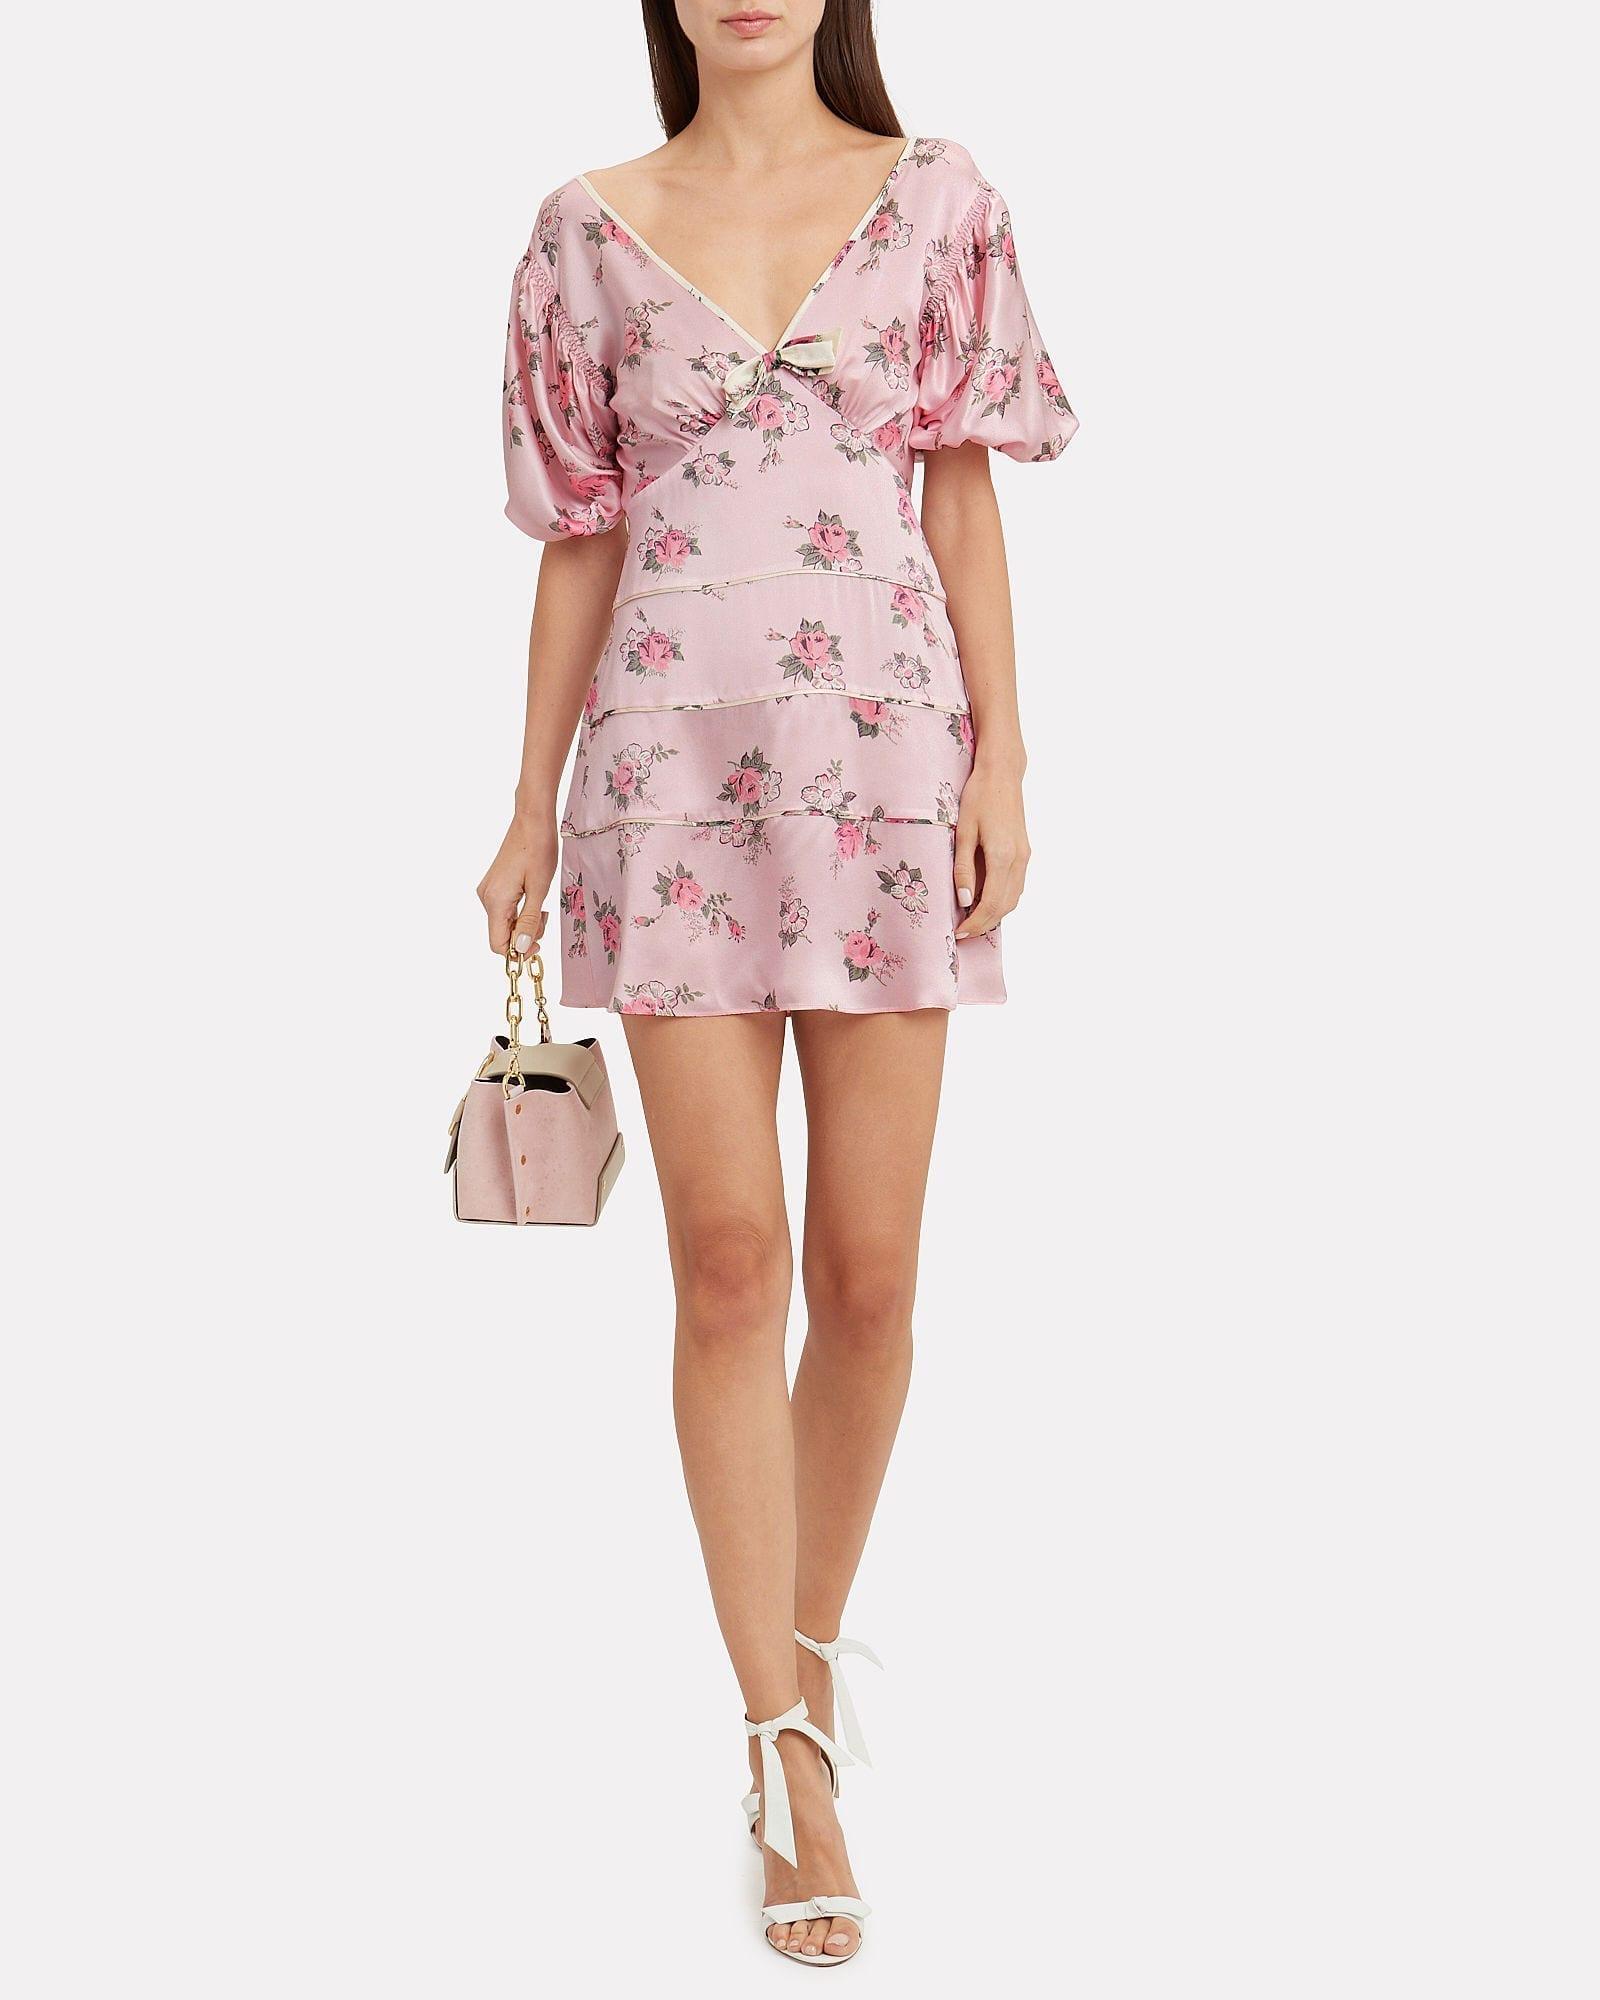 LOVESHACKFANCY Lennox Mini Pink / Floral Printed Dress